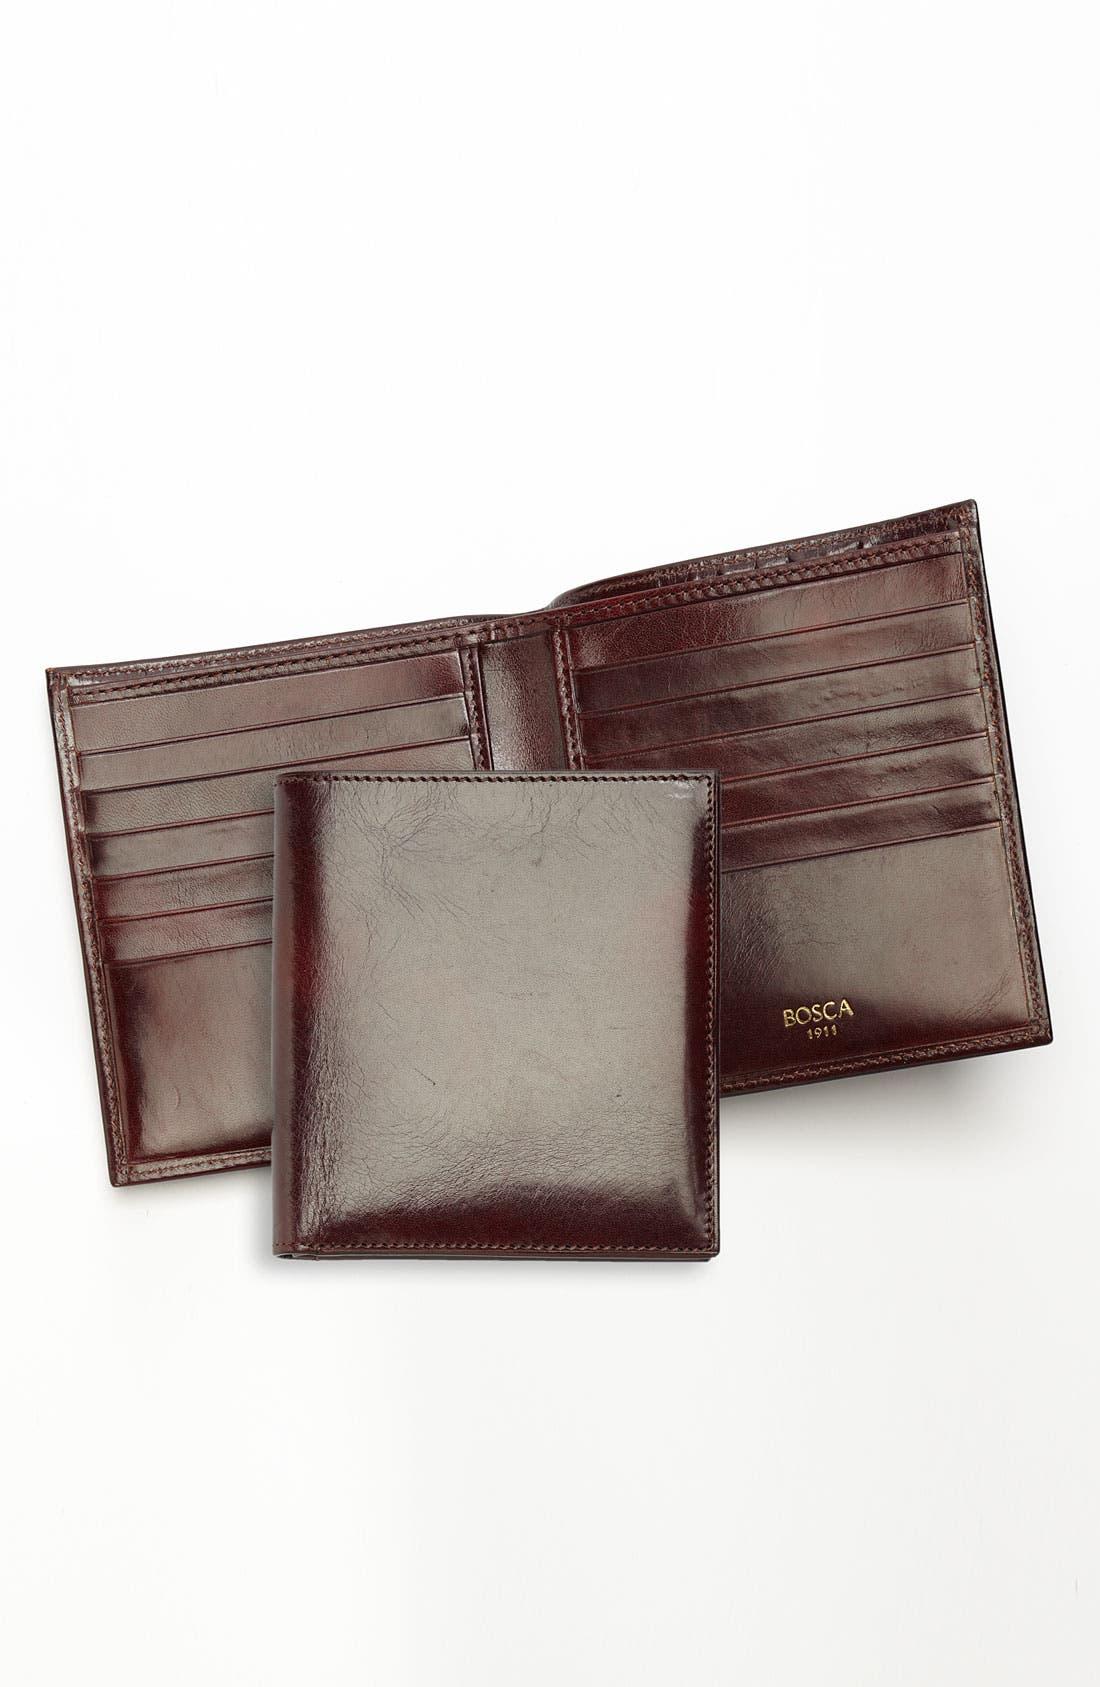 'Old Leather' Credit Wallet,                         Main,                         color, DARK BROWN